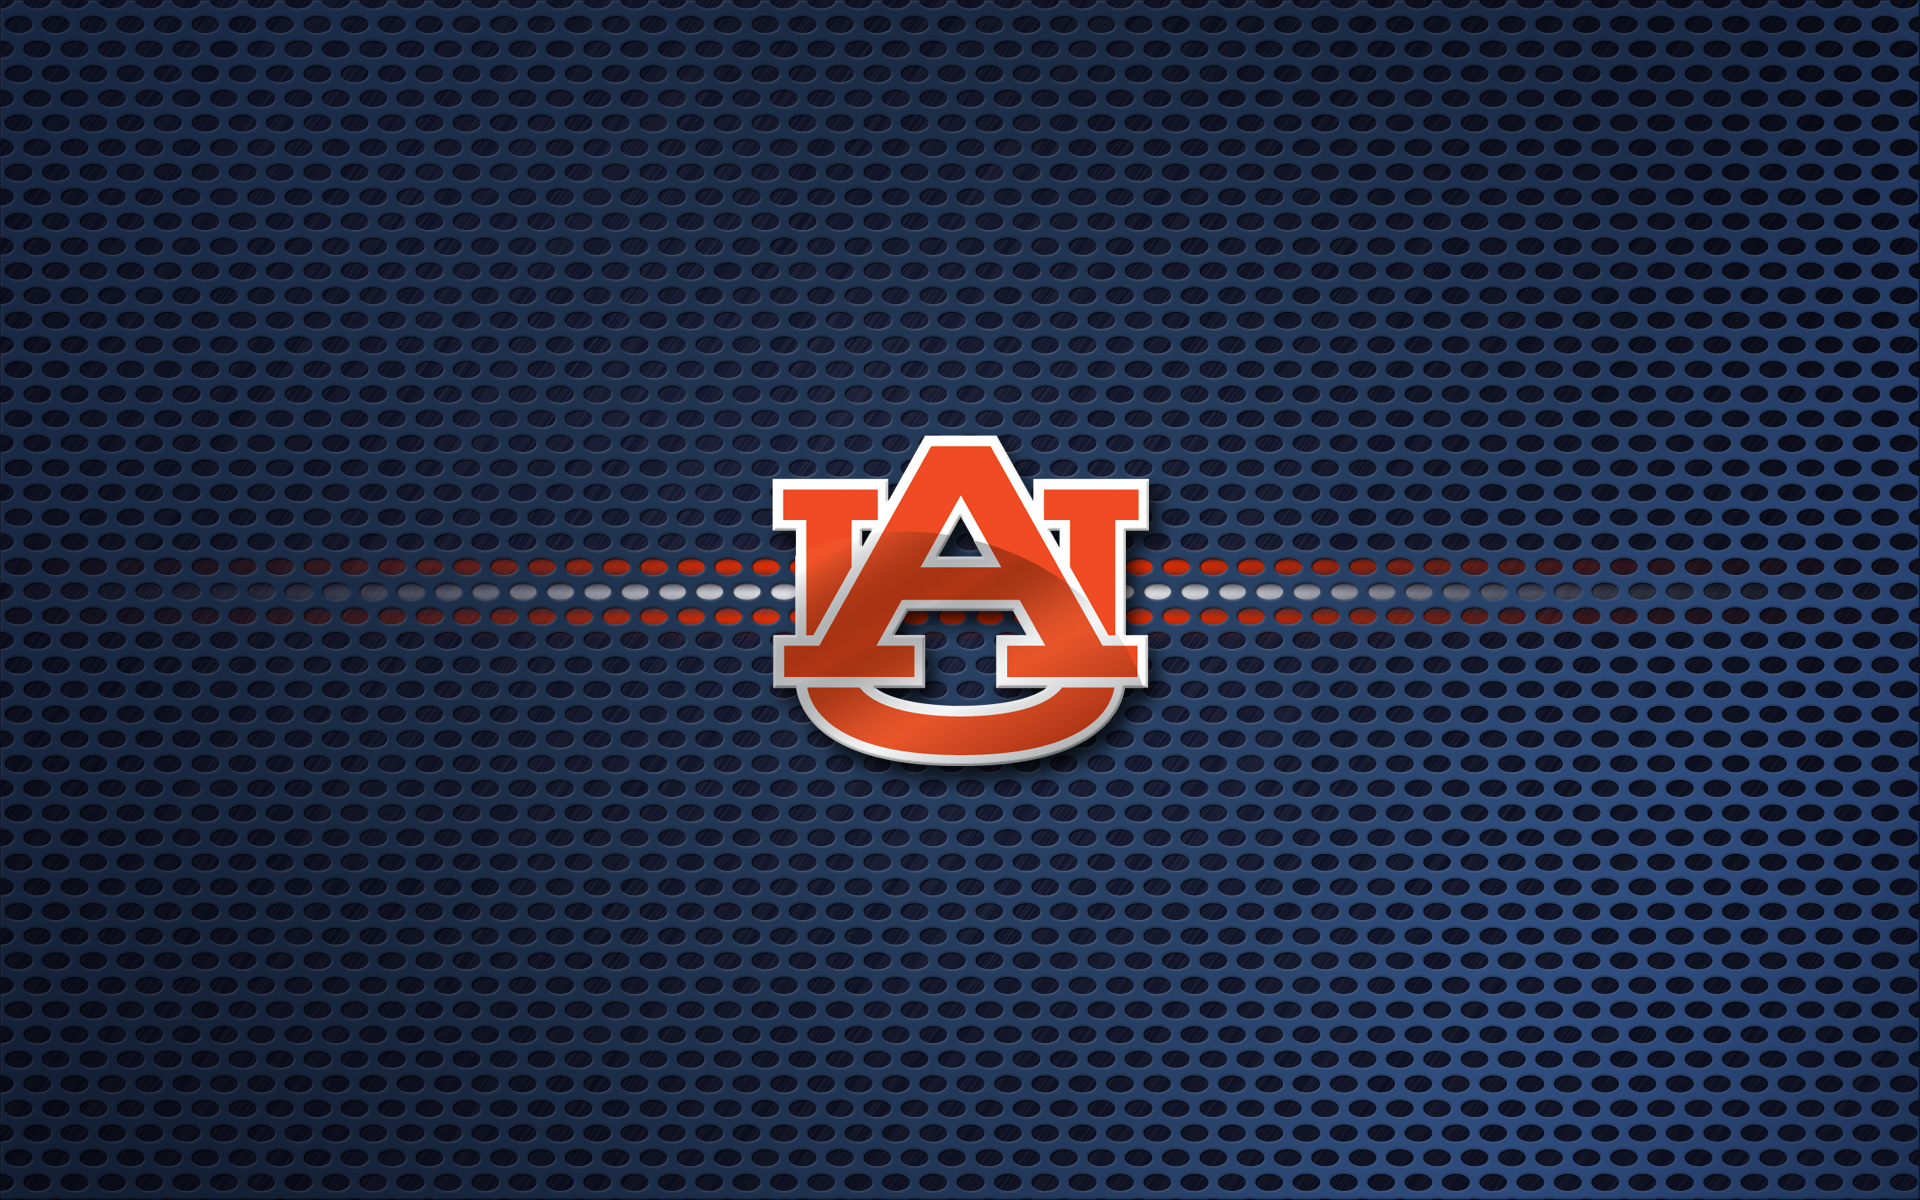 Fall Themed Wallpaper Desktop Auburn Tigers Football Wallpaper Hd Pixelstalk Net